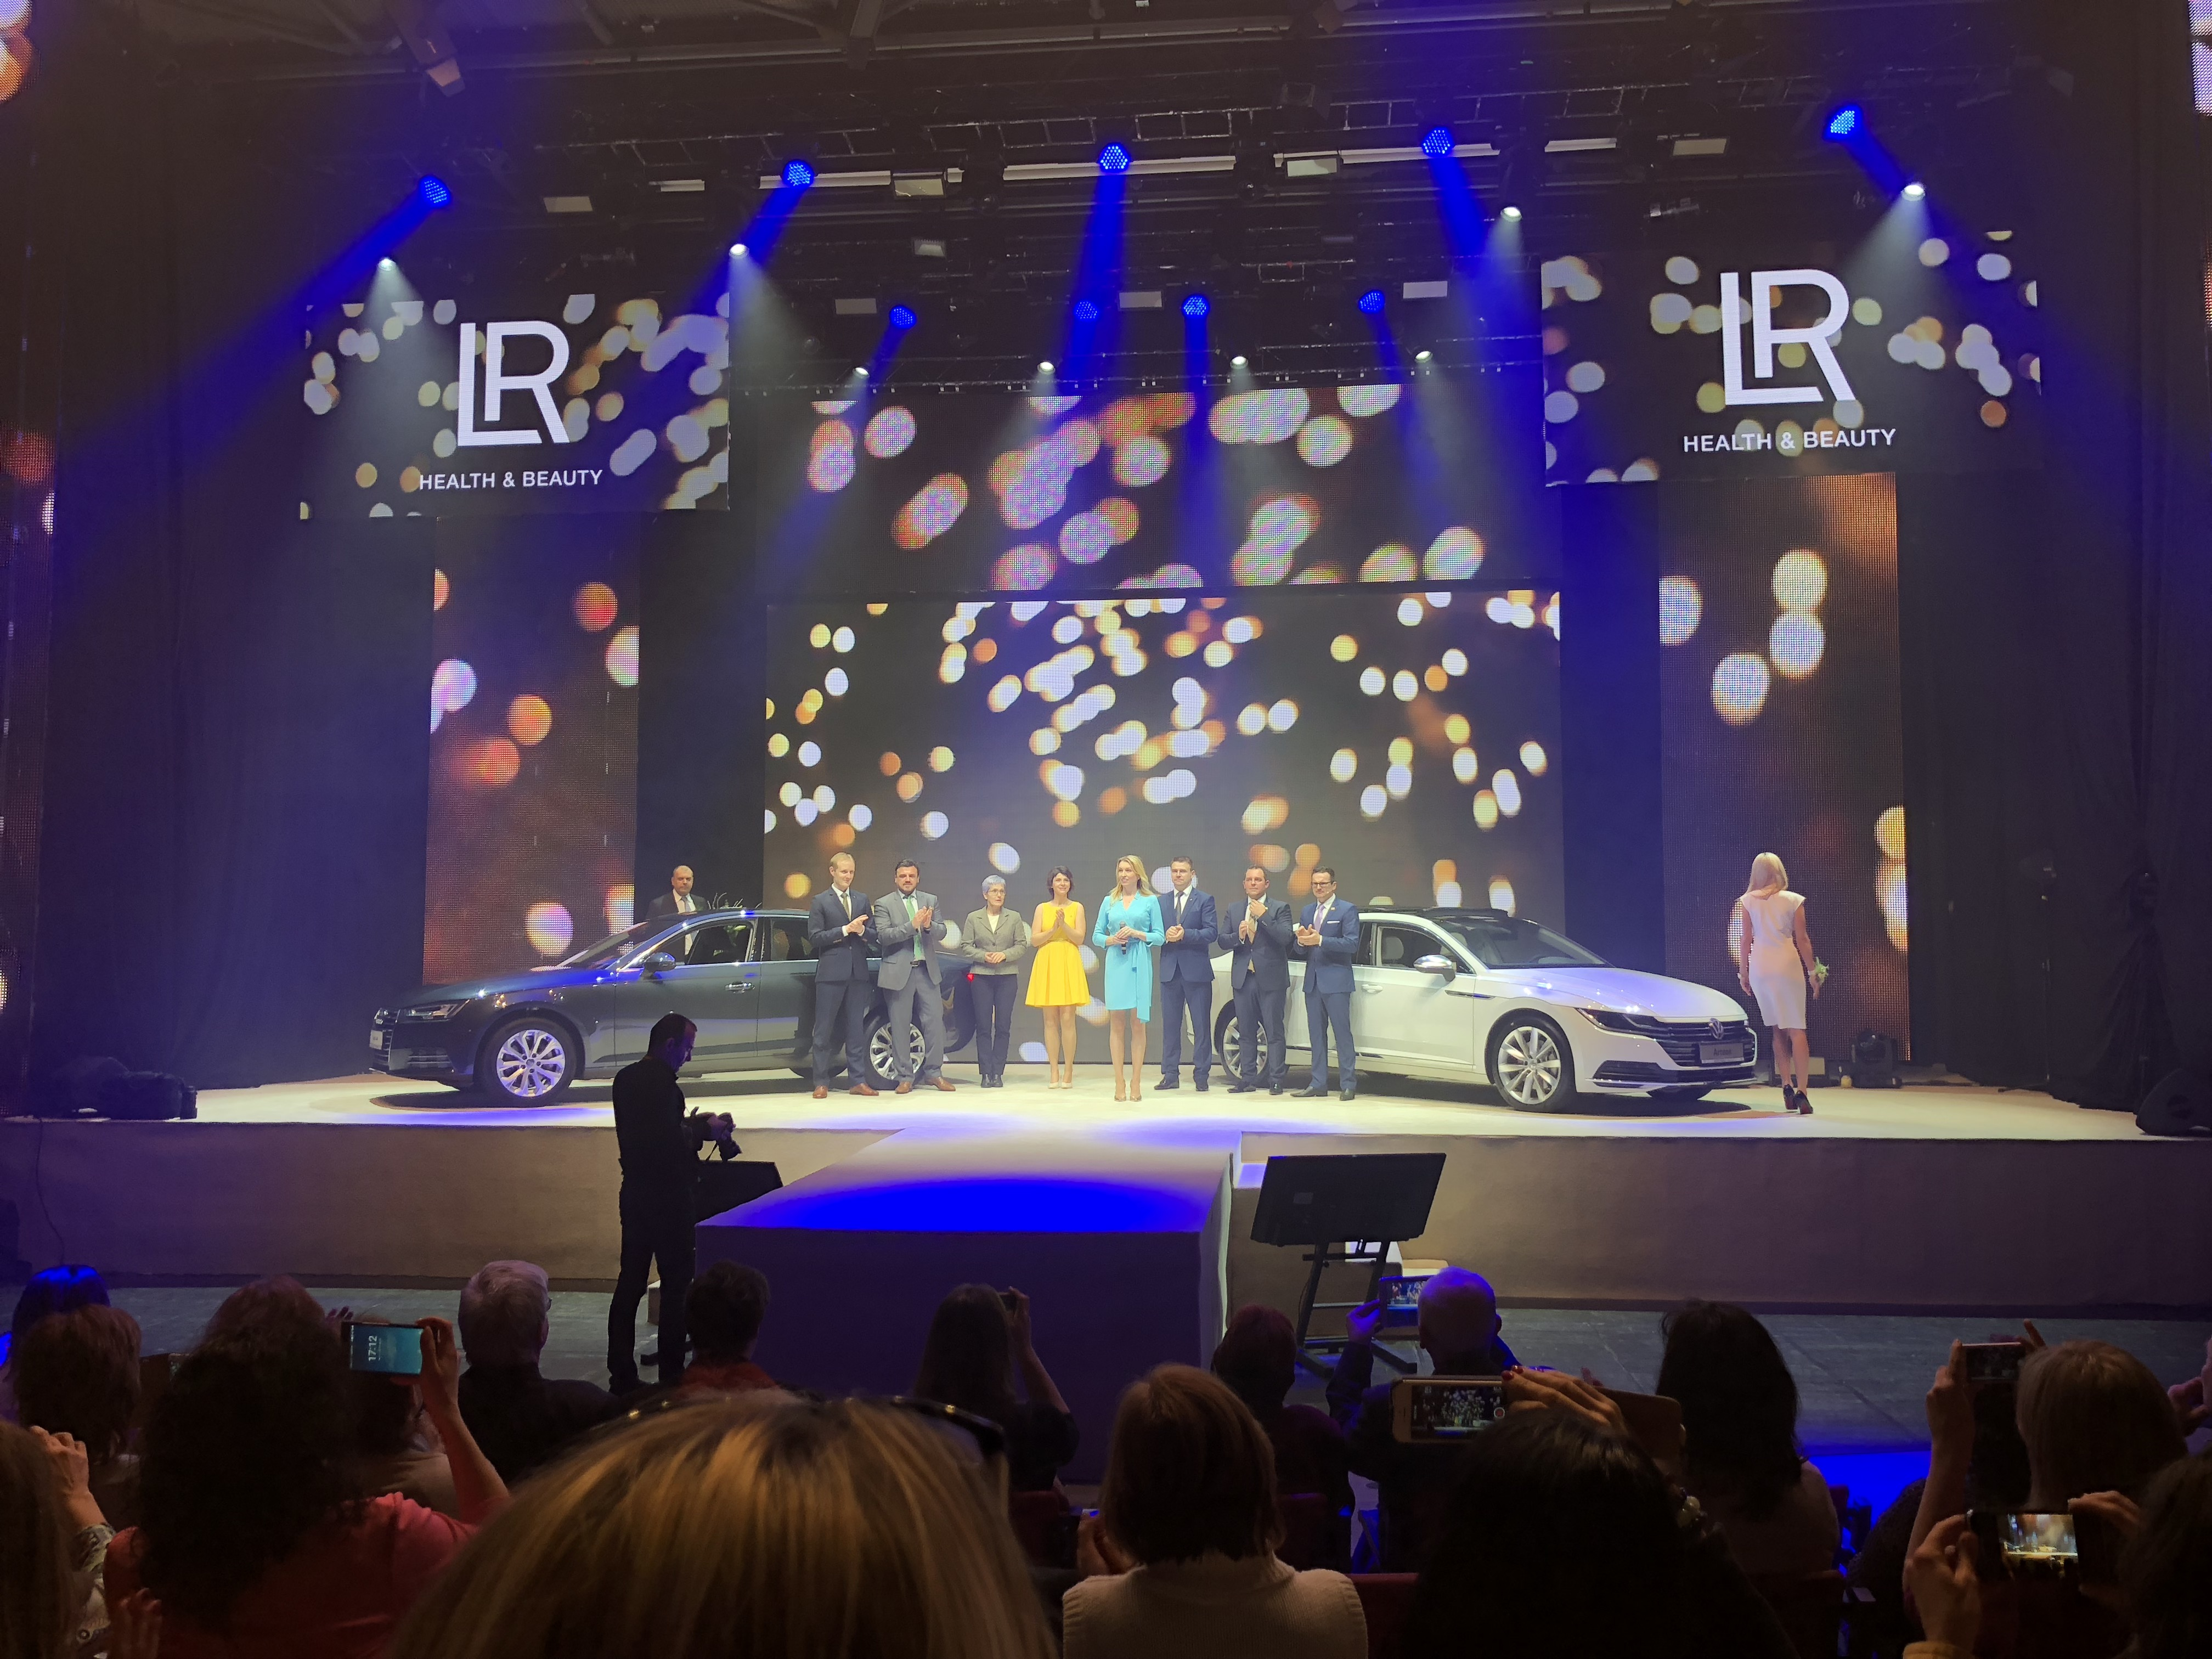 LIFETAKT DAY 2018, KICKOFF MEETING LR HEALTH & BEAUTY